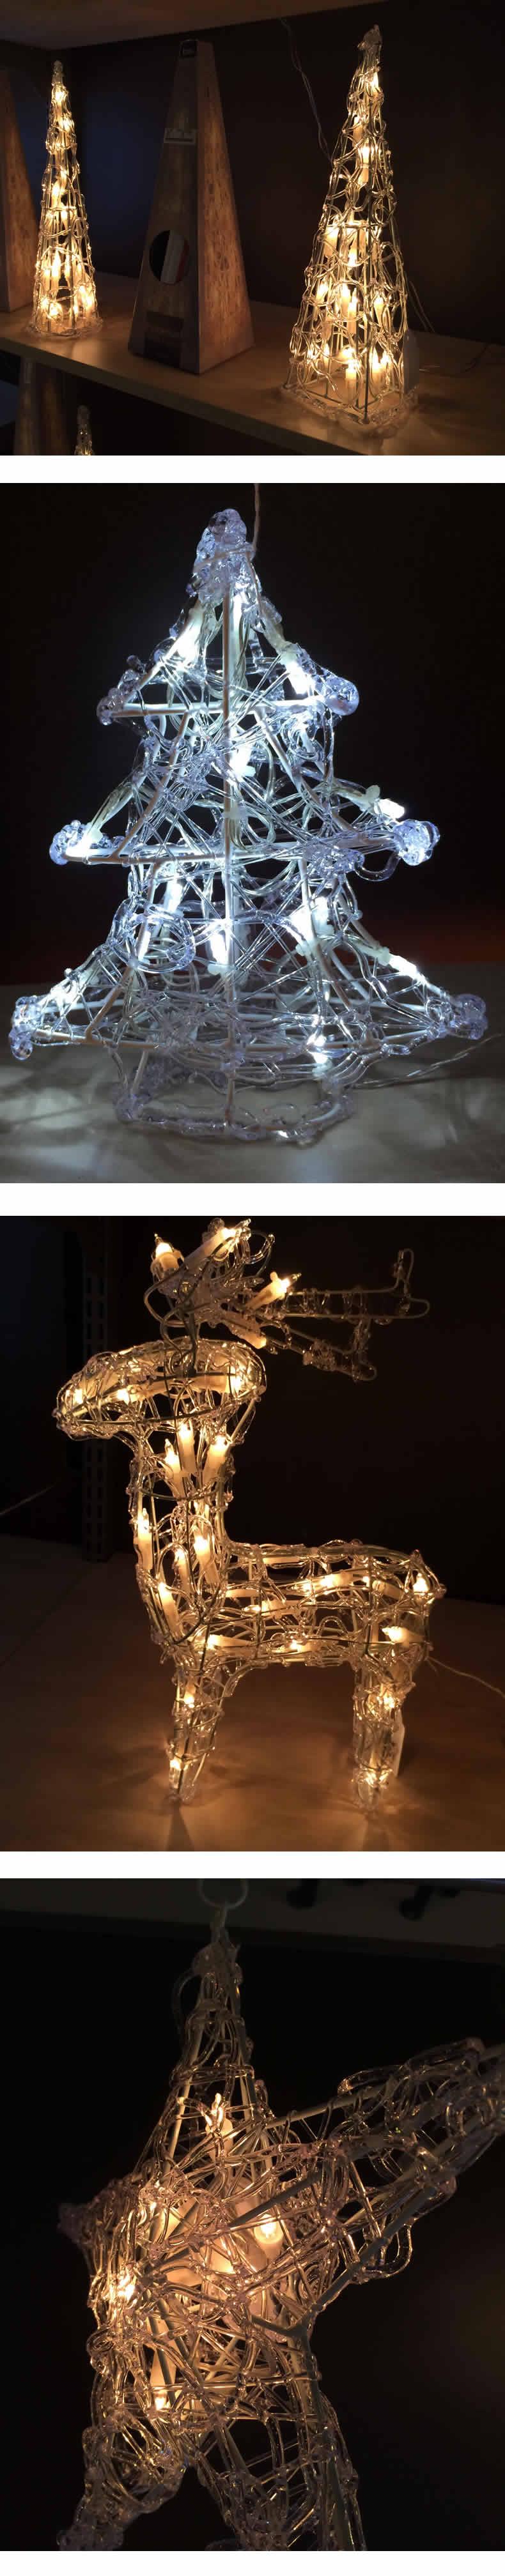 design acryl weihnachtsbeleuchtung pyramide christbaum. Black Bedroom Furniture Sets. Home Design Ideas